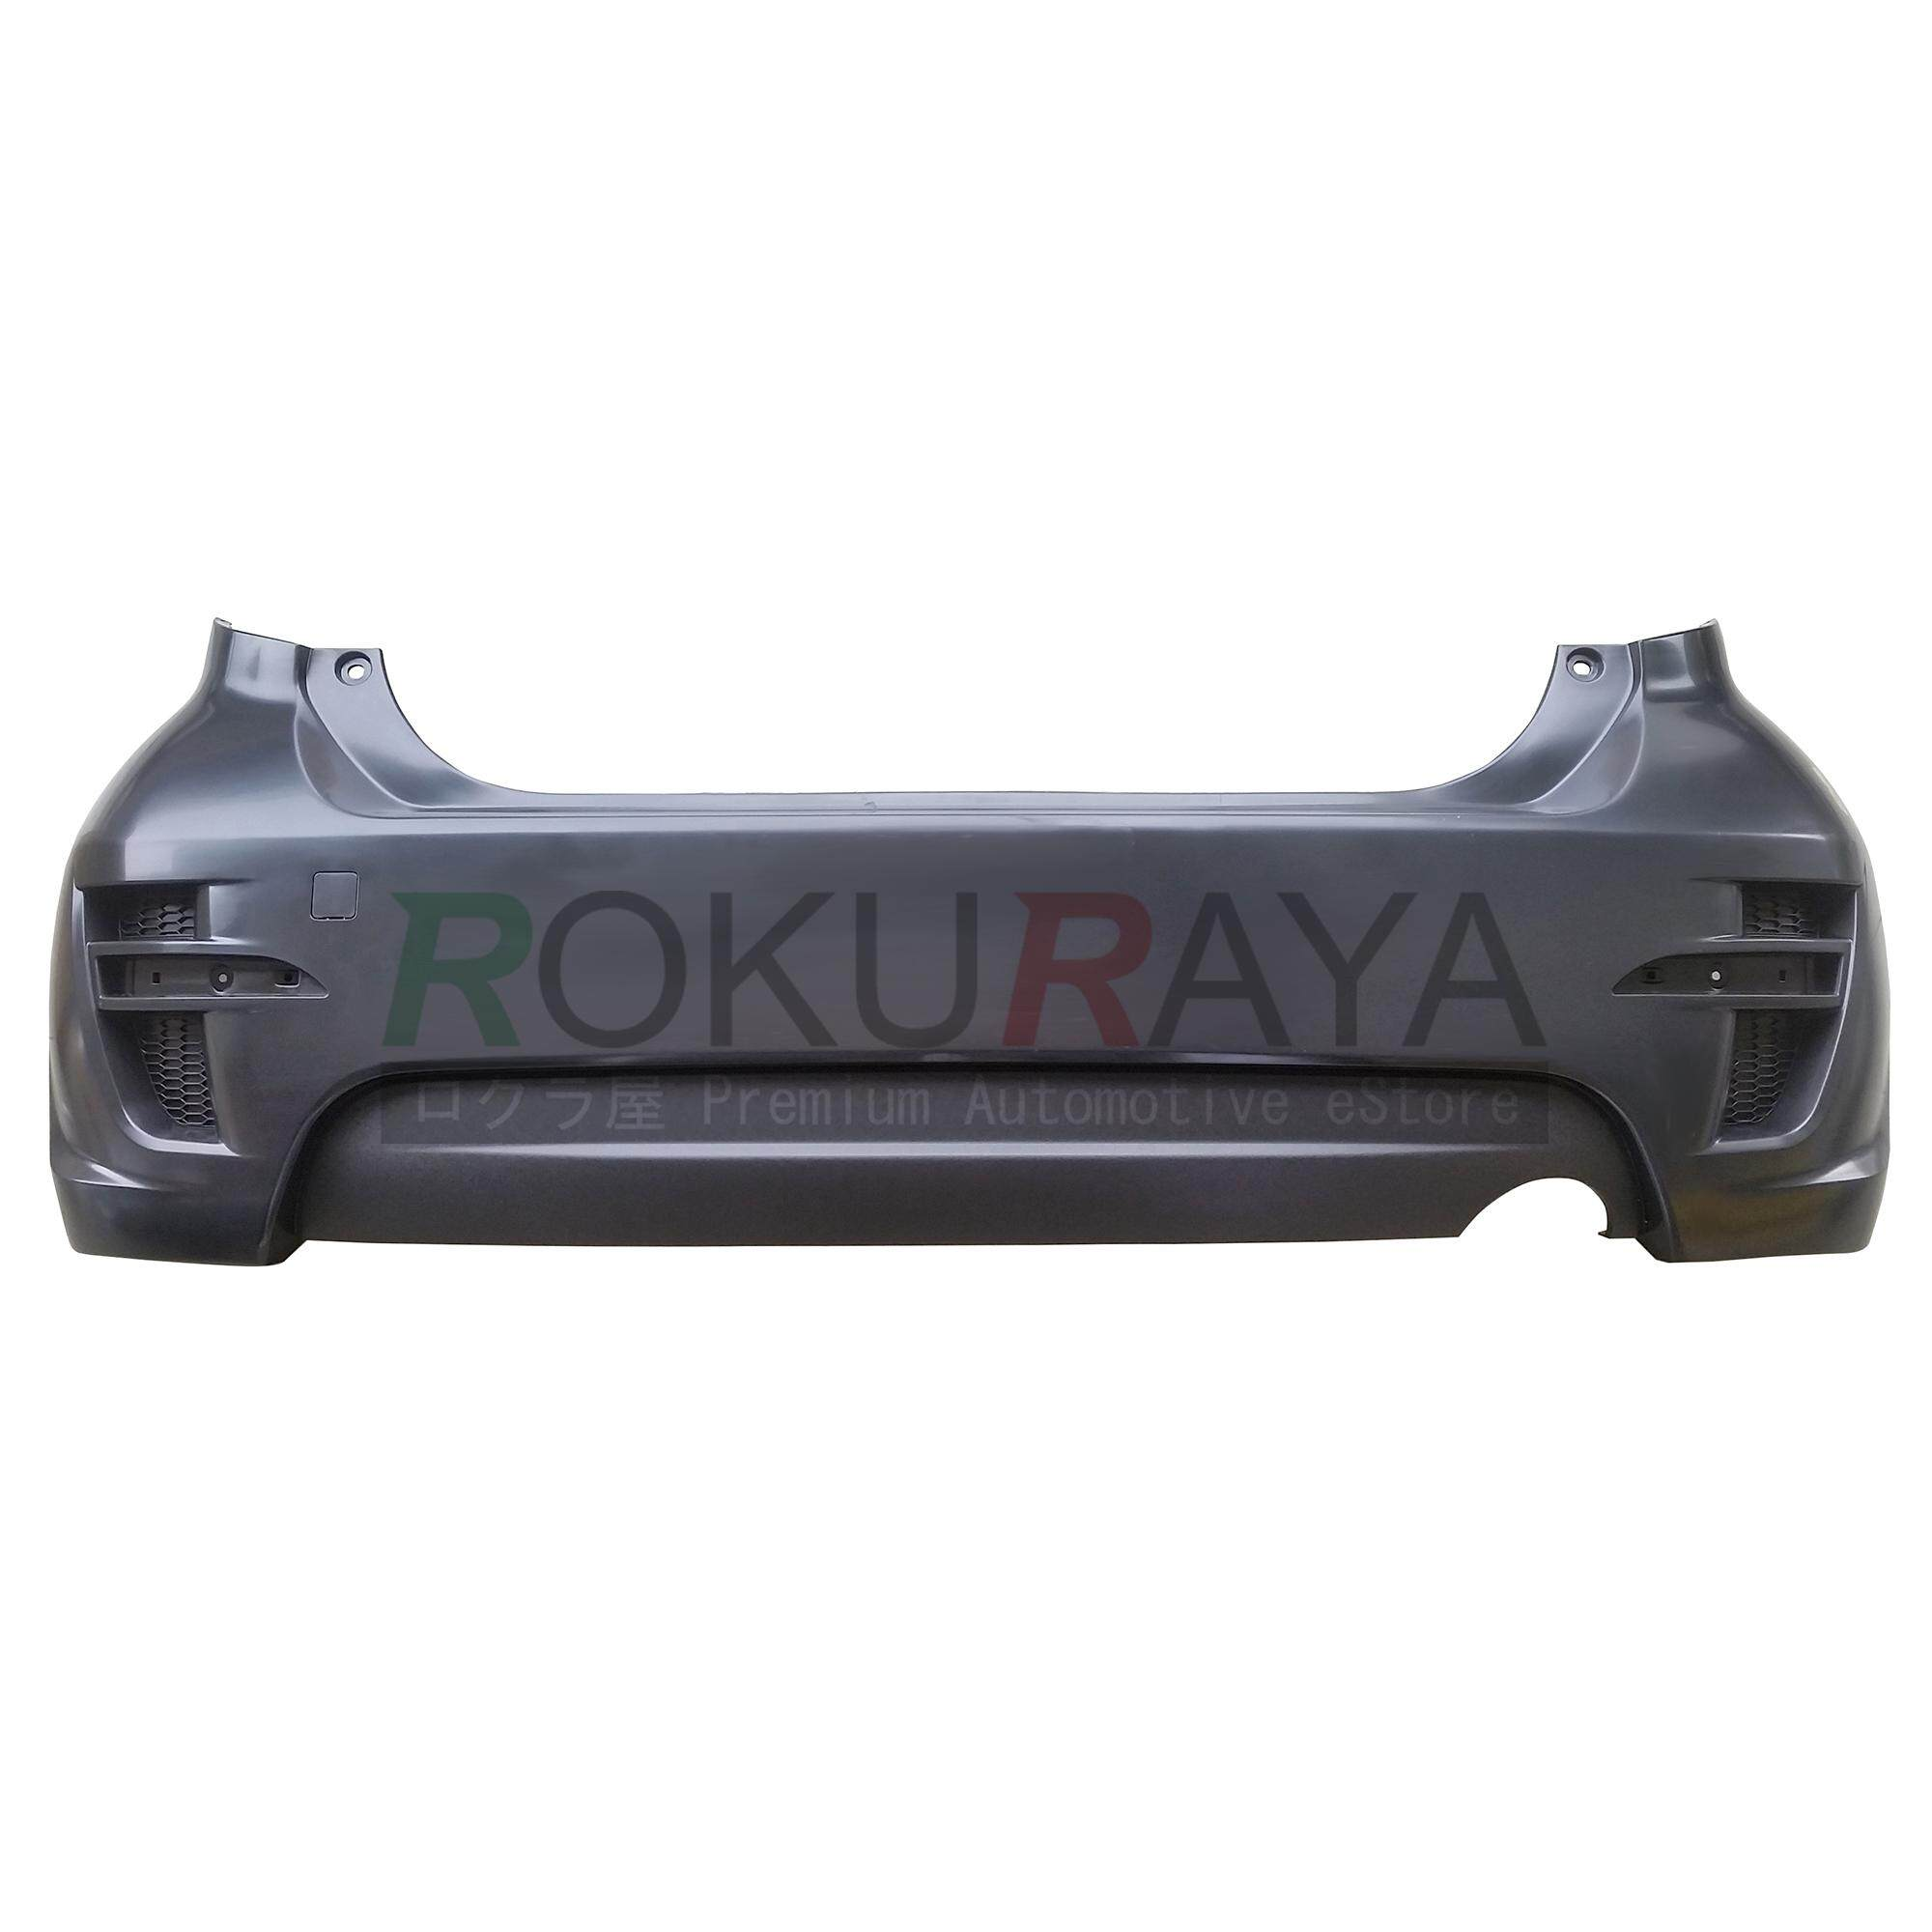 Perodua Myvi Se2 First Generation (2005-2011) Se 2008 Special Edition Rear Back Bumper Polypropylene Pp Plastic Body Part Oem Replacement Spare Part - Black By Automart Rr.